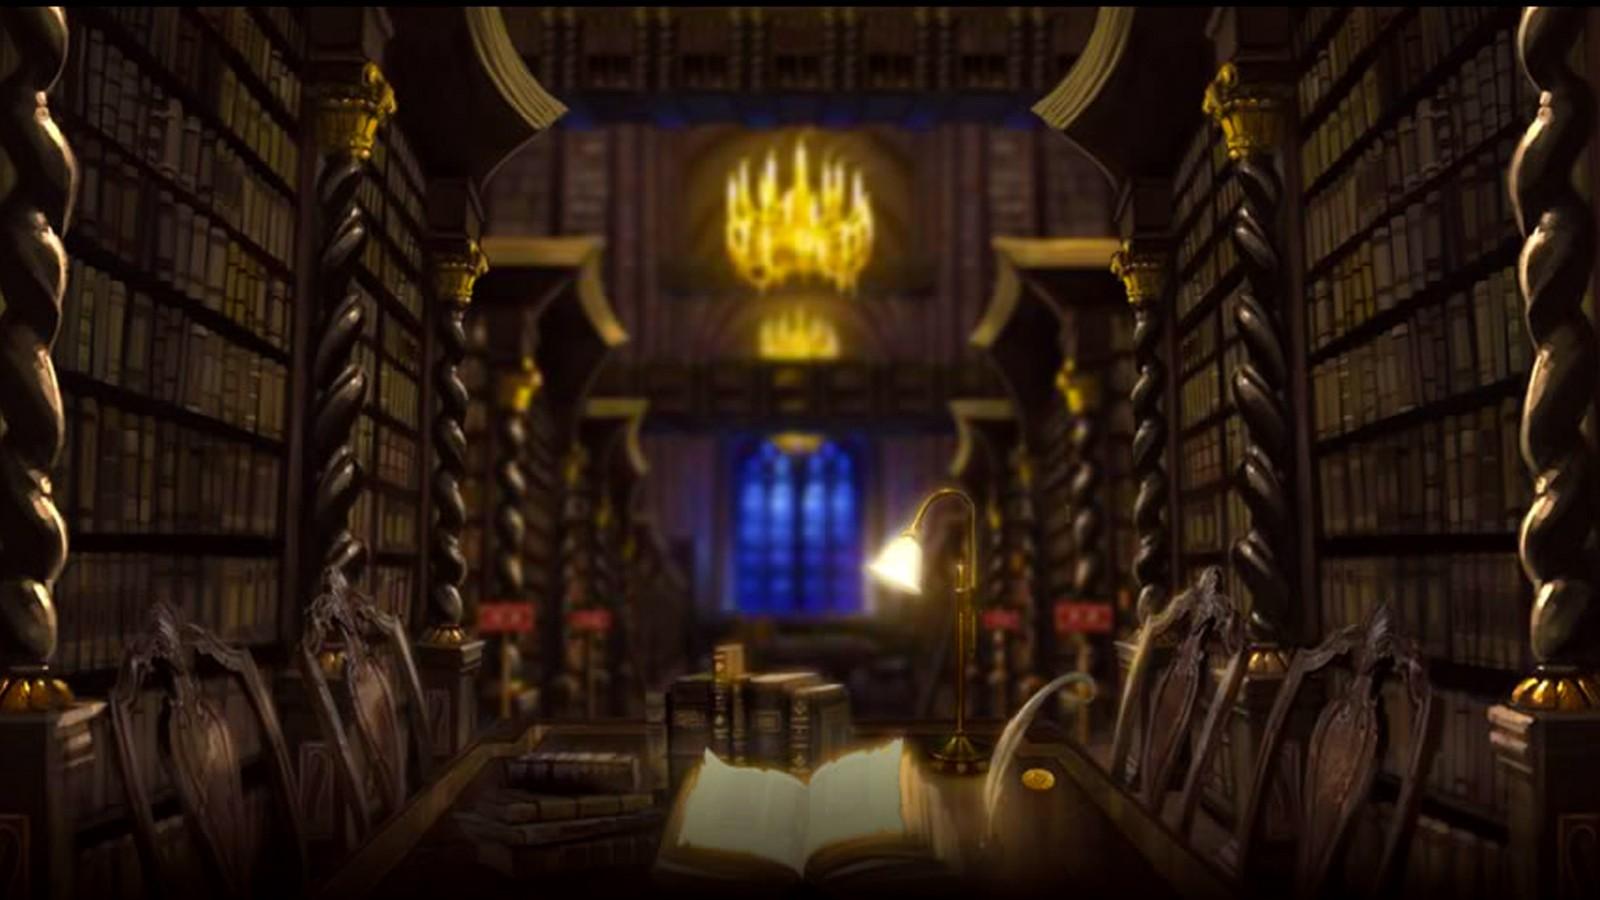 Fantasy Library By xxtayce in fantasy